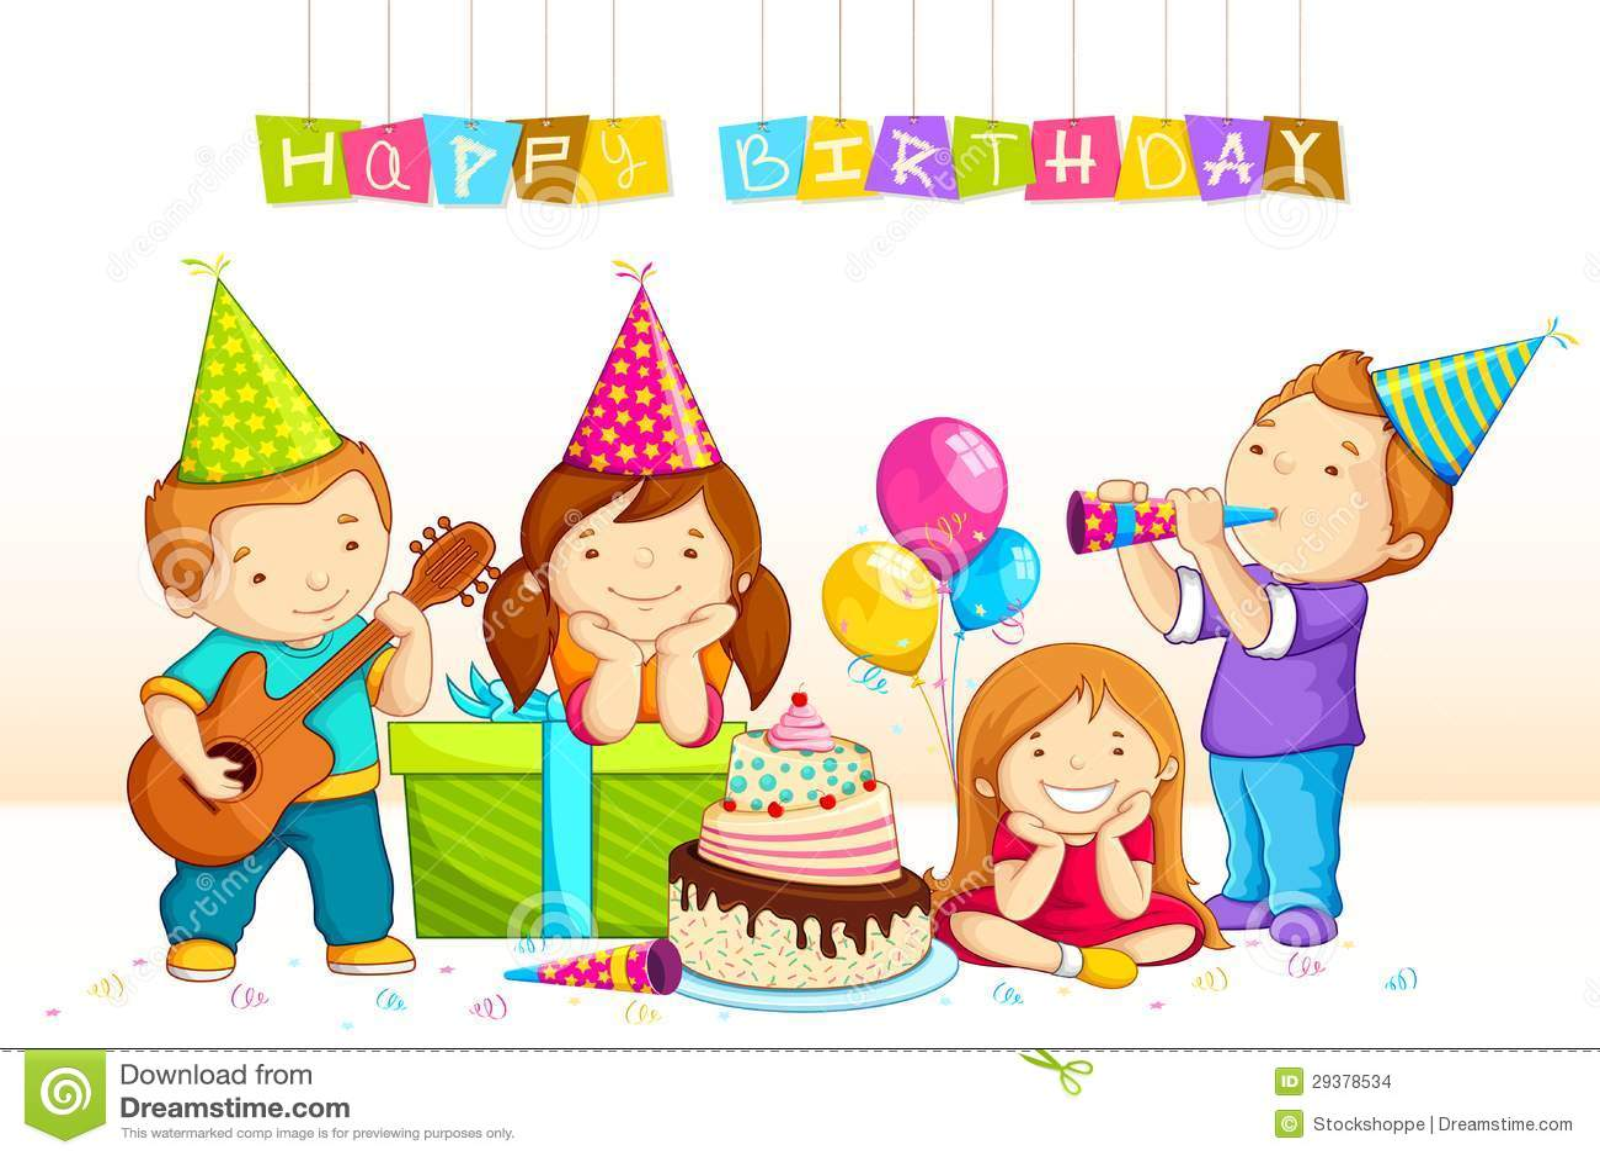 Wir Feiern Geburtstag